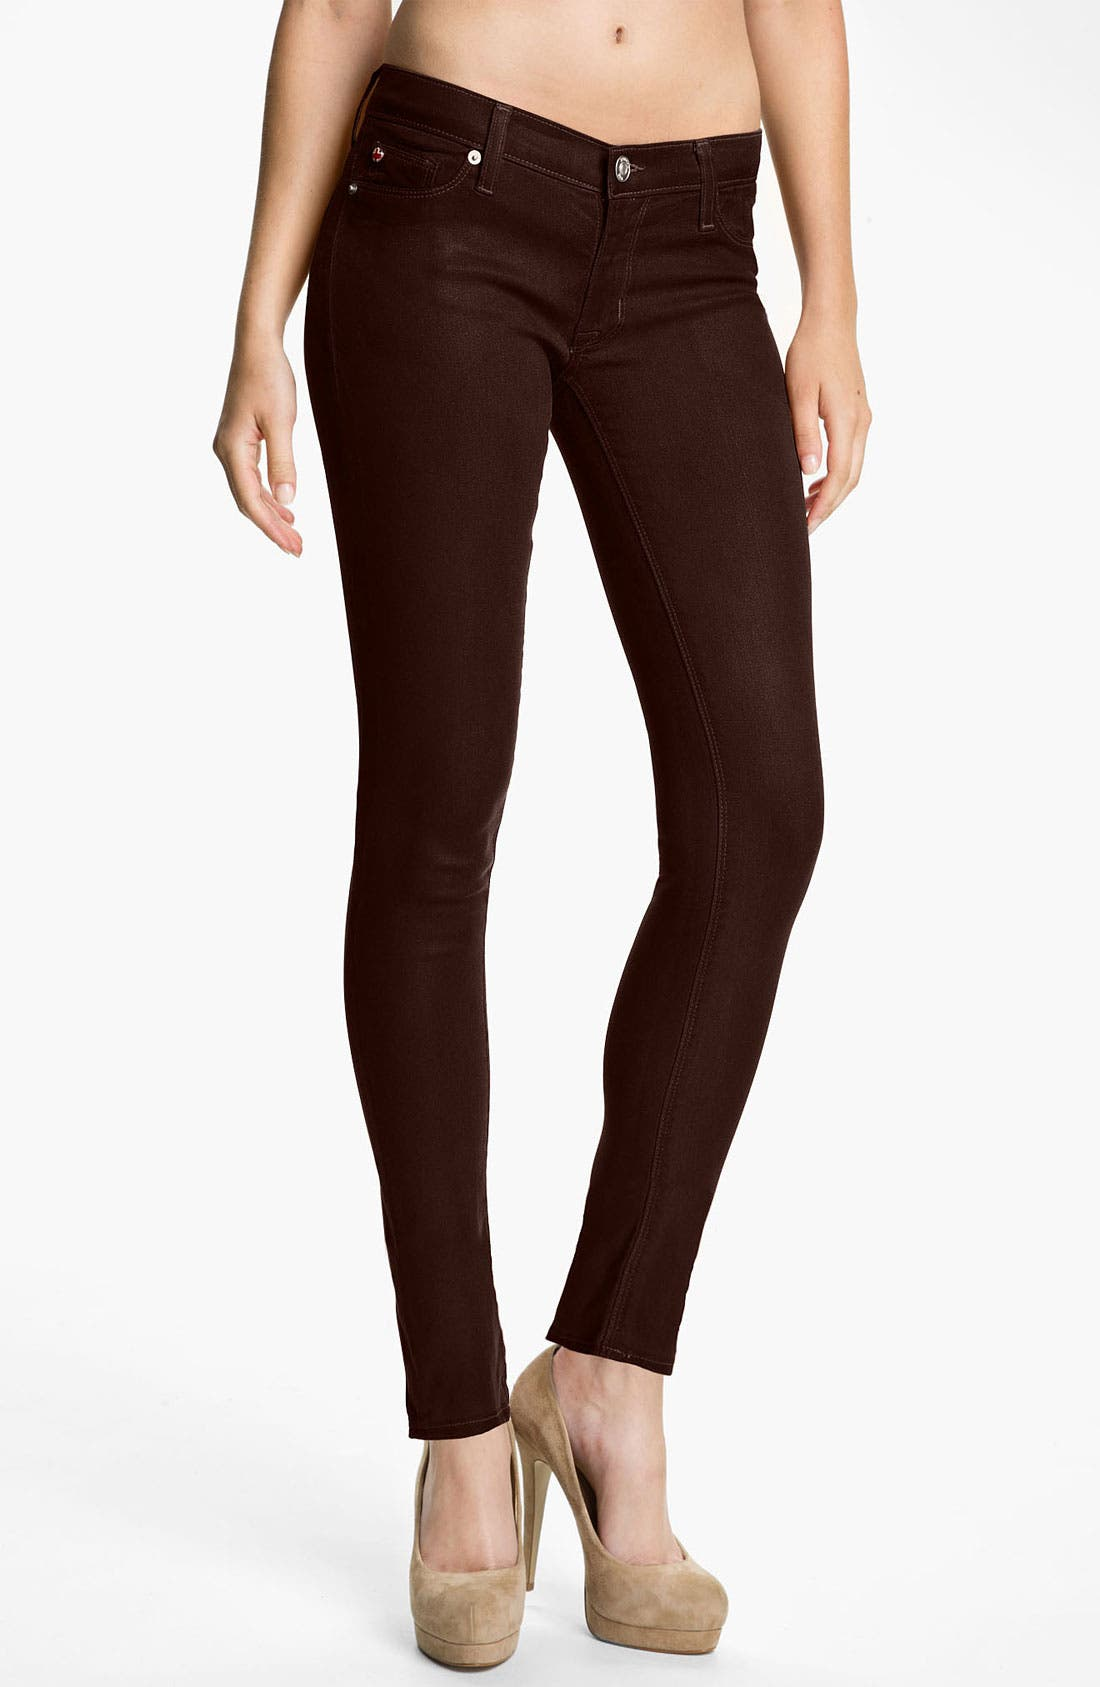 Alternate Image 1 Selected - Hudson Jeans 'Krista' Super Skinny Jeans (Stout Wax)